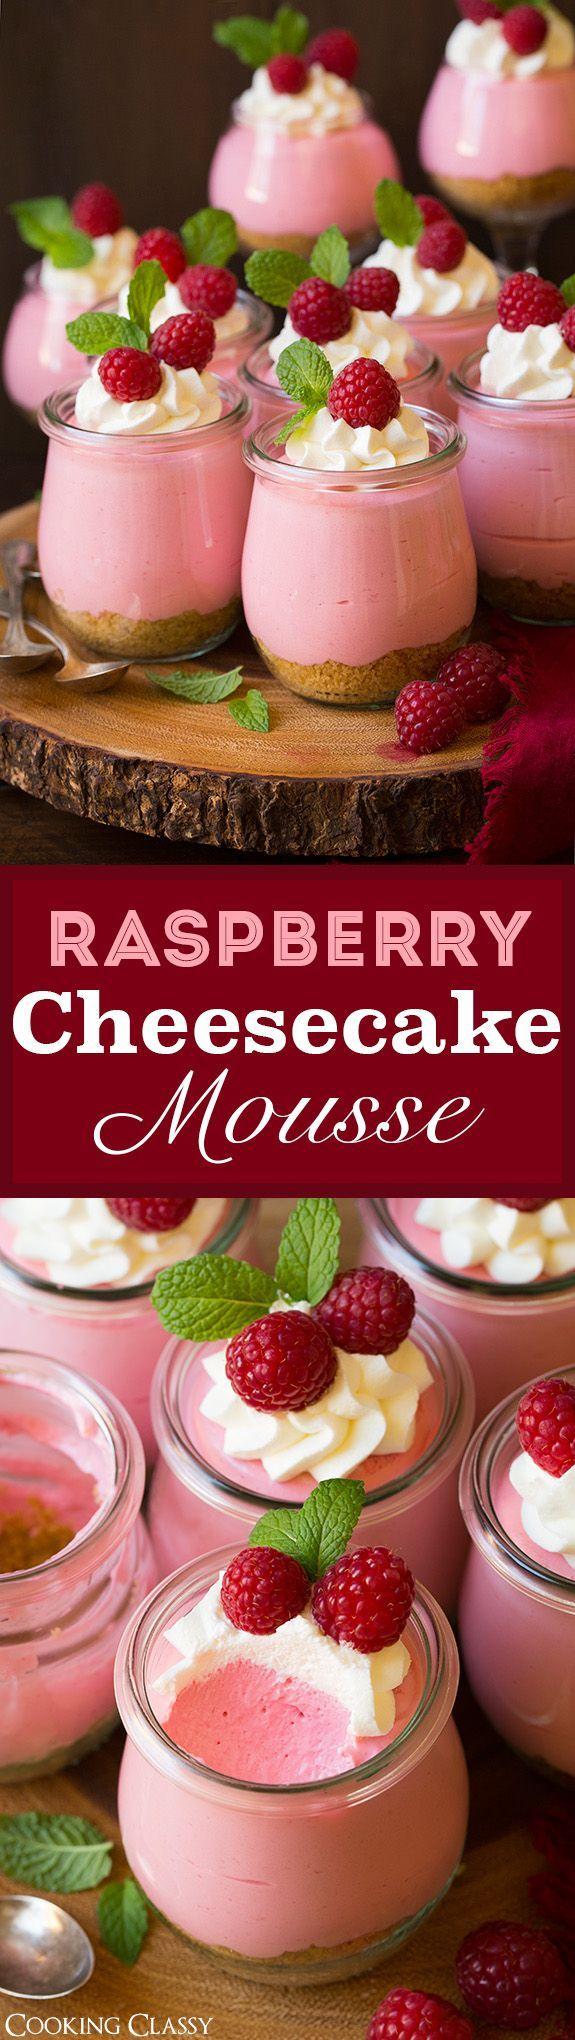 1 Mint, leaves. 15 oz Raspberries, fresh. 10 Raspberries, fresh. 1 Food coloring, red. 4 tbsp Granulated sugar. 2 1/4 cups Powdered sugar. 1 tsp Vanilla extract. 1 cup Graham cracker crumbs. 1/4 cup Butter, unsalted. 12 oz Cream cheese. 2 1/4 cups Heavy cream. 2 tsp Gelatin, powder. 3 tbsp Water.